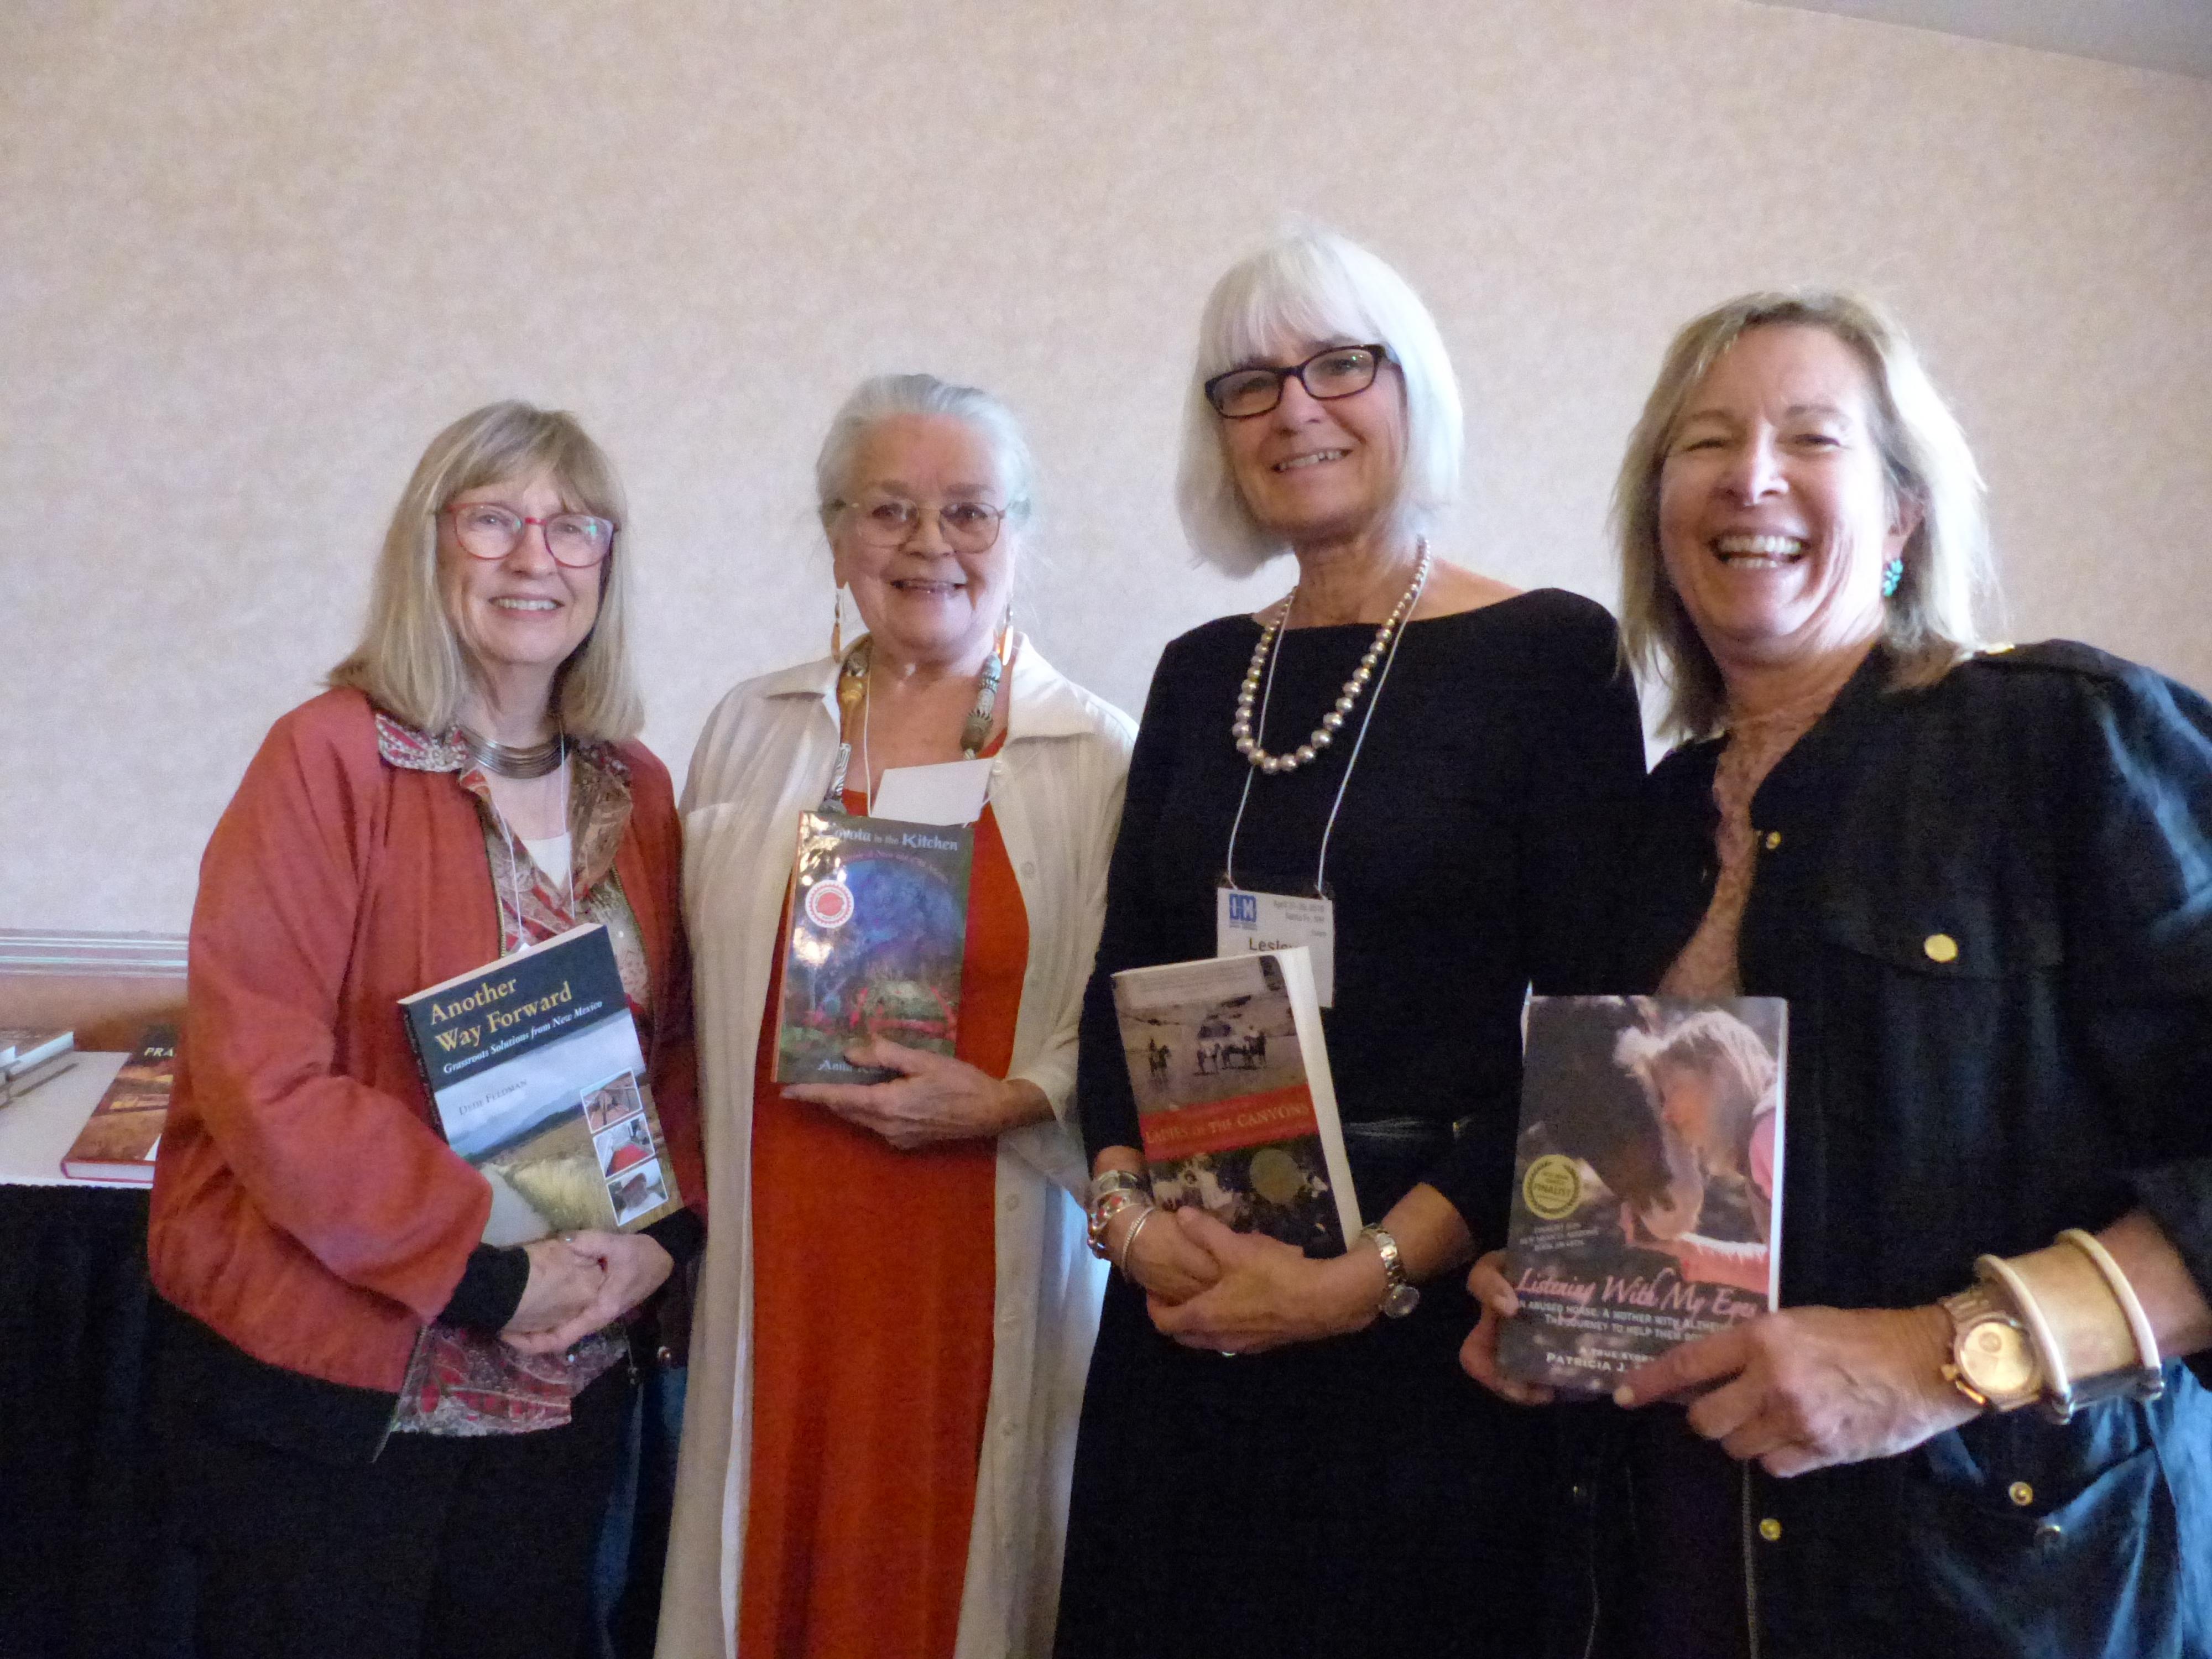 (l to r) Dede Feldman, Anita Rodriquez, Lesley Poling-Kempes, Patricia J. Conoway